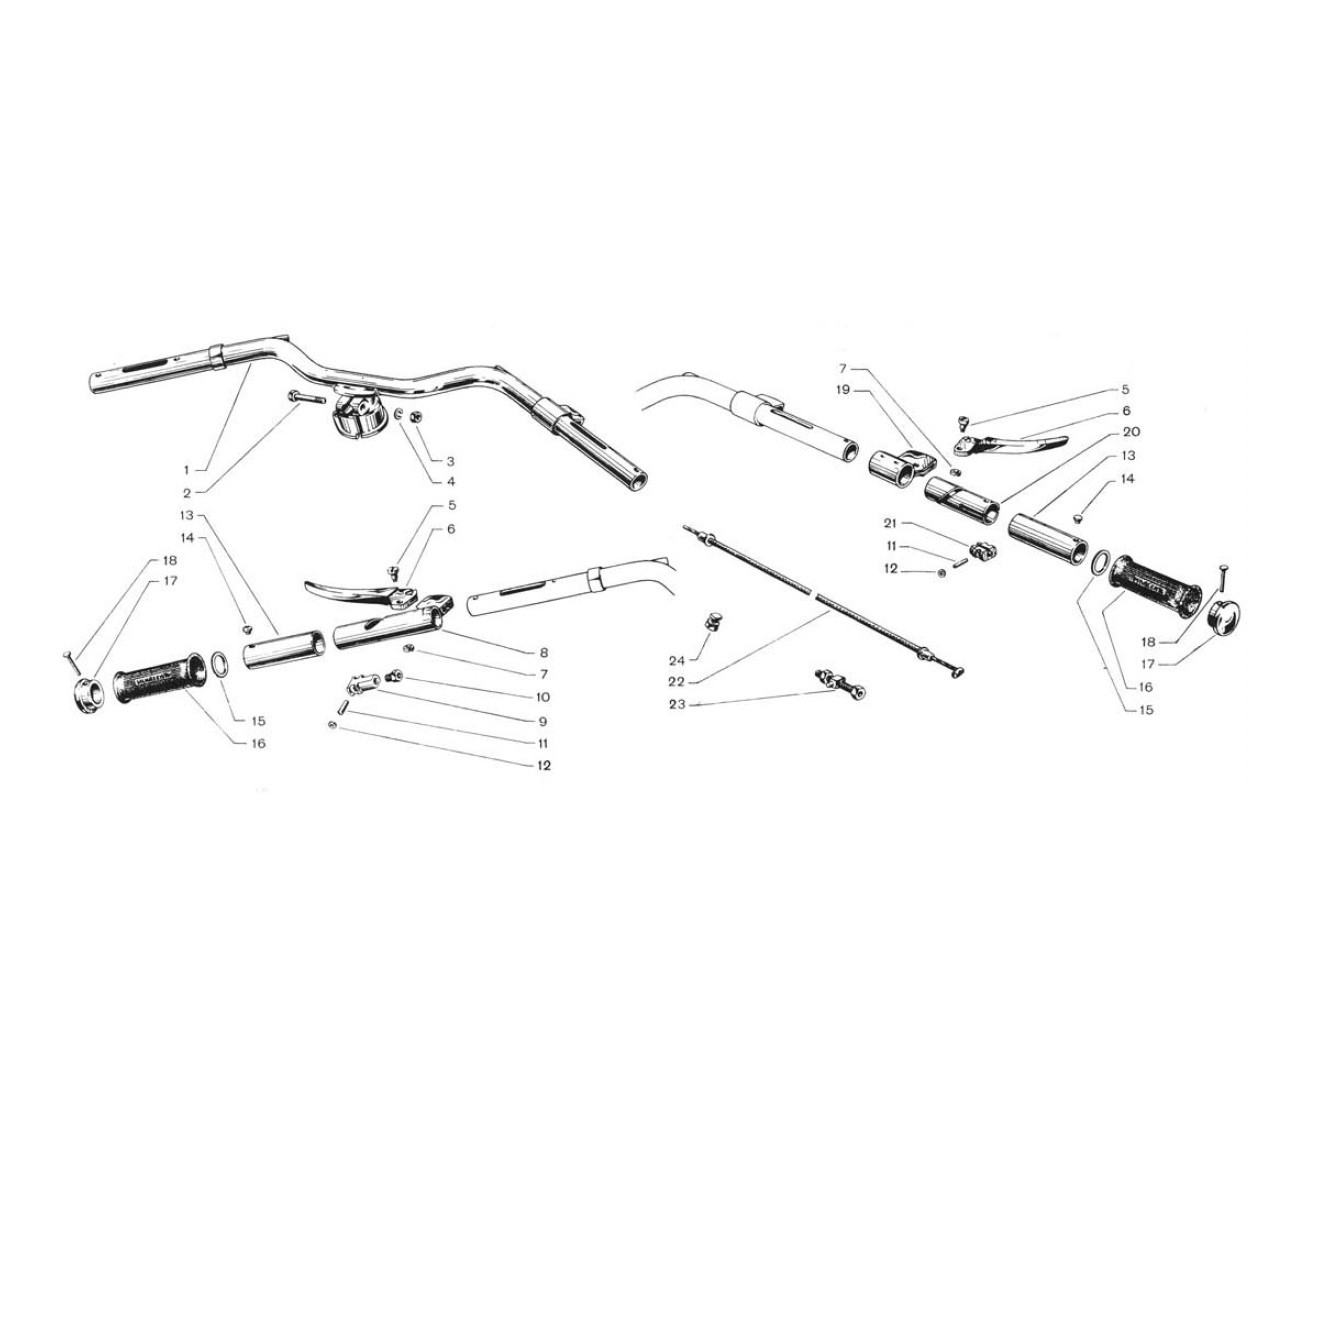 Manubrio acciaio con comando (Tav.11)